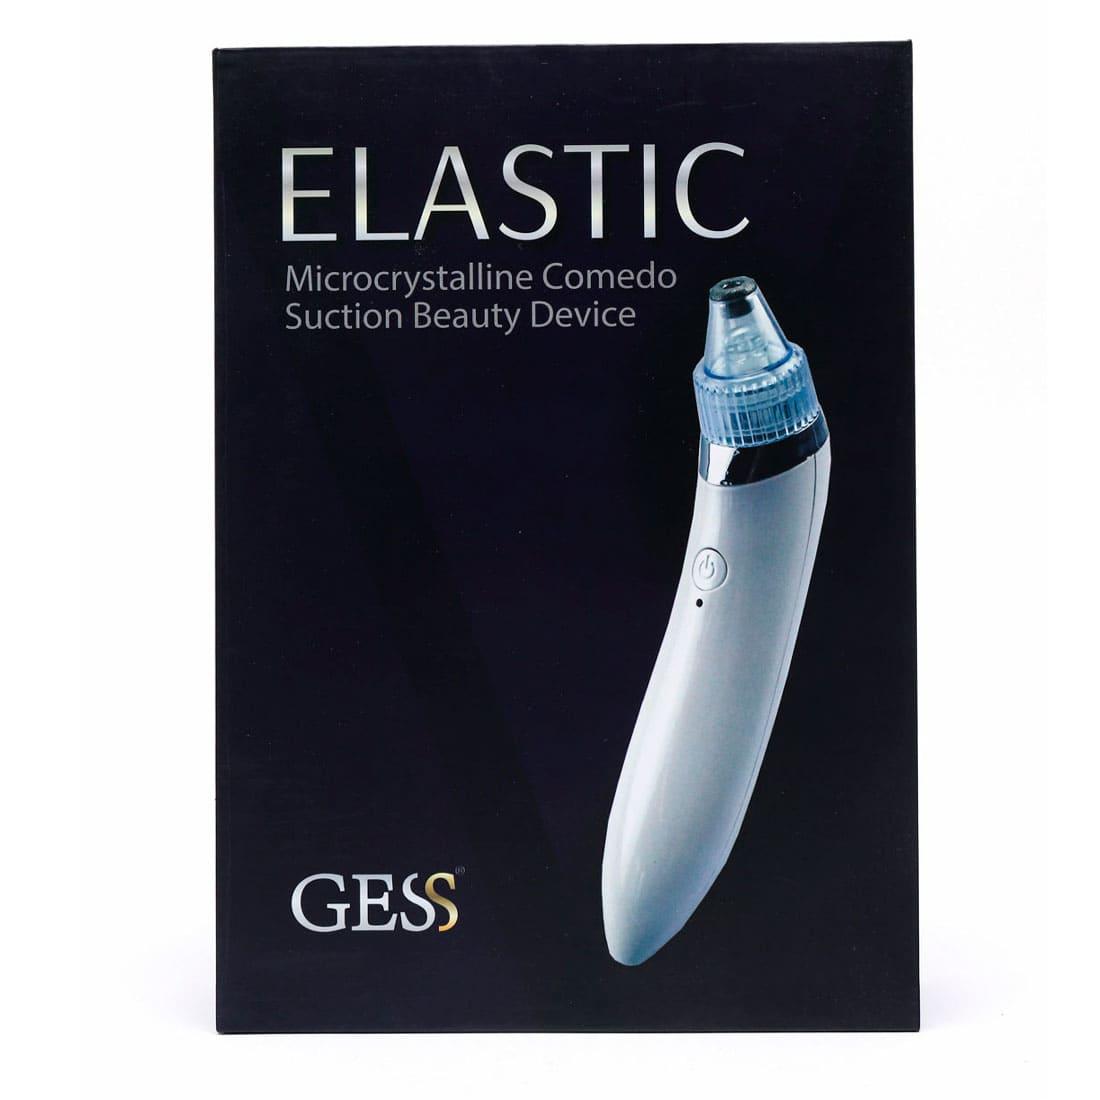 Elastic gess 630 8